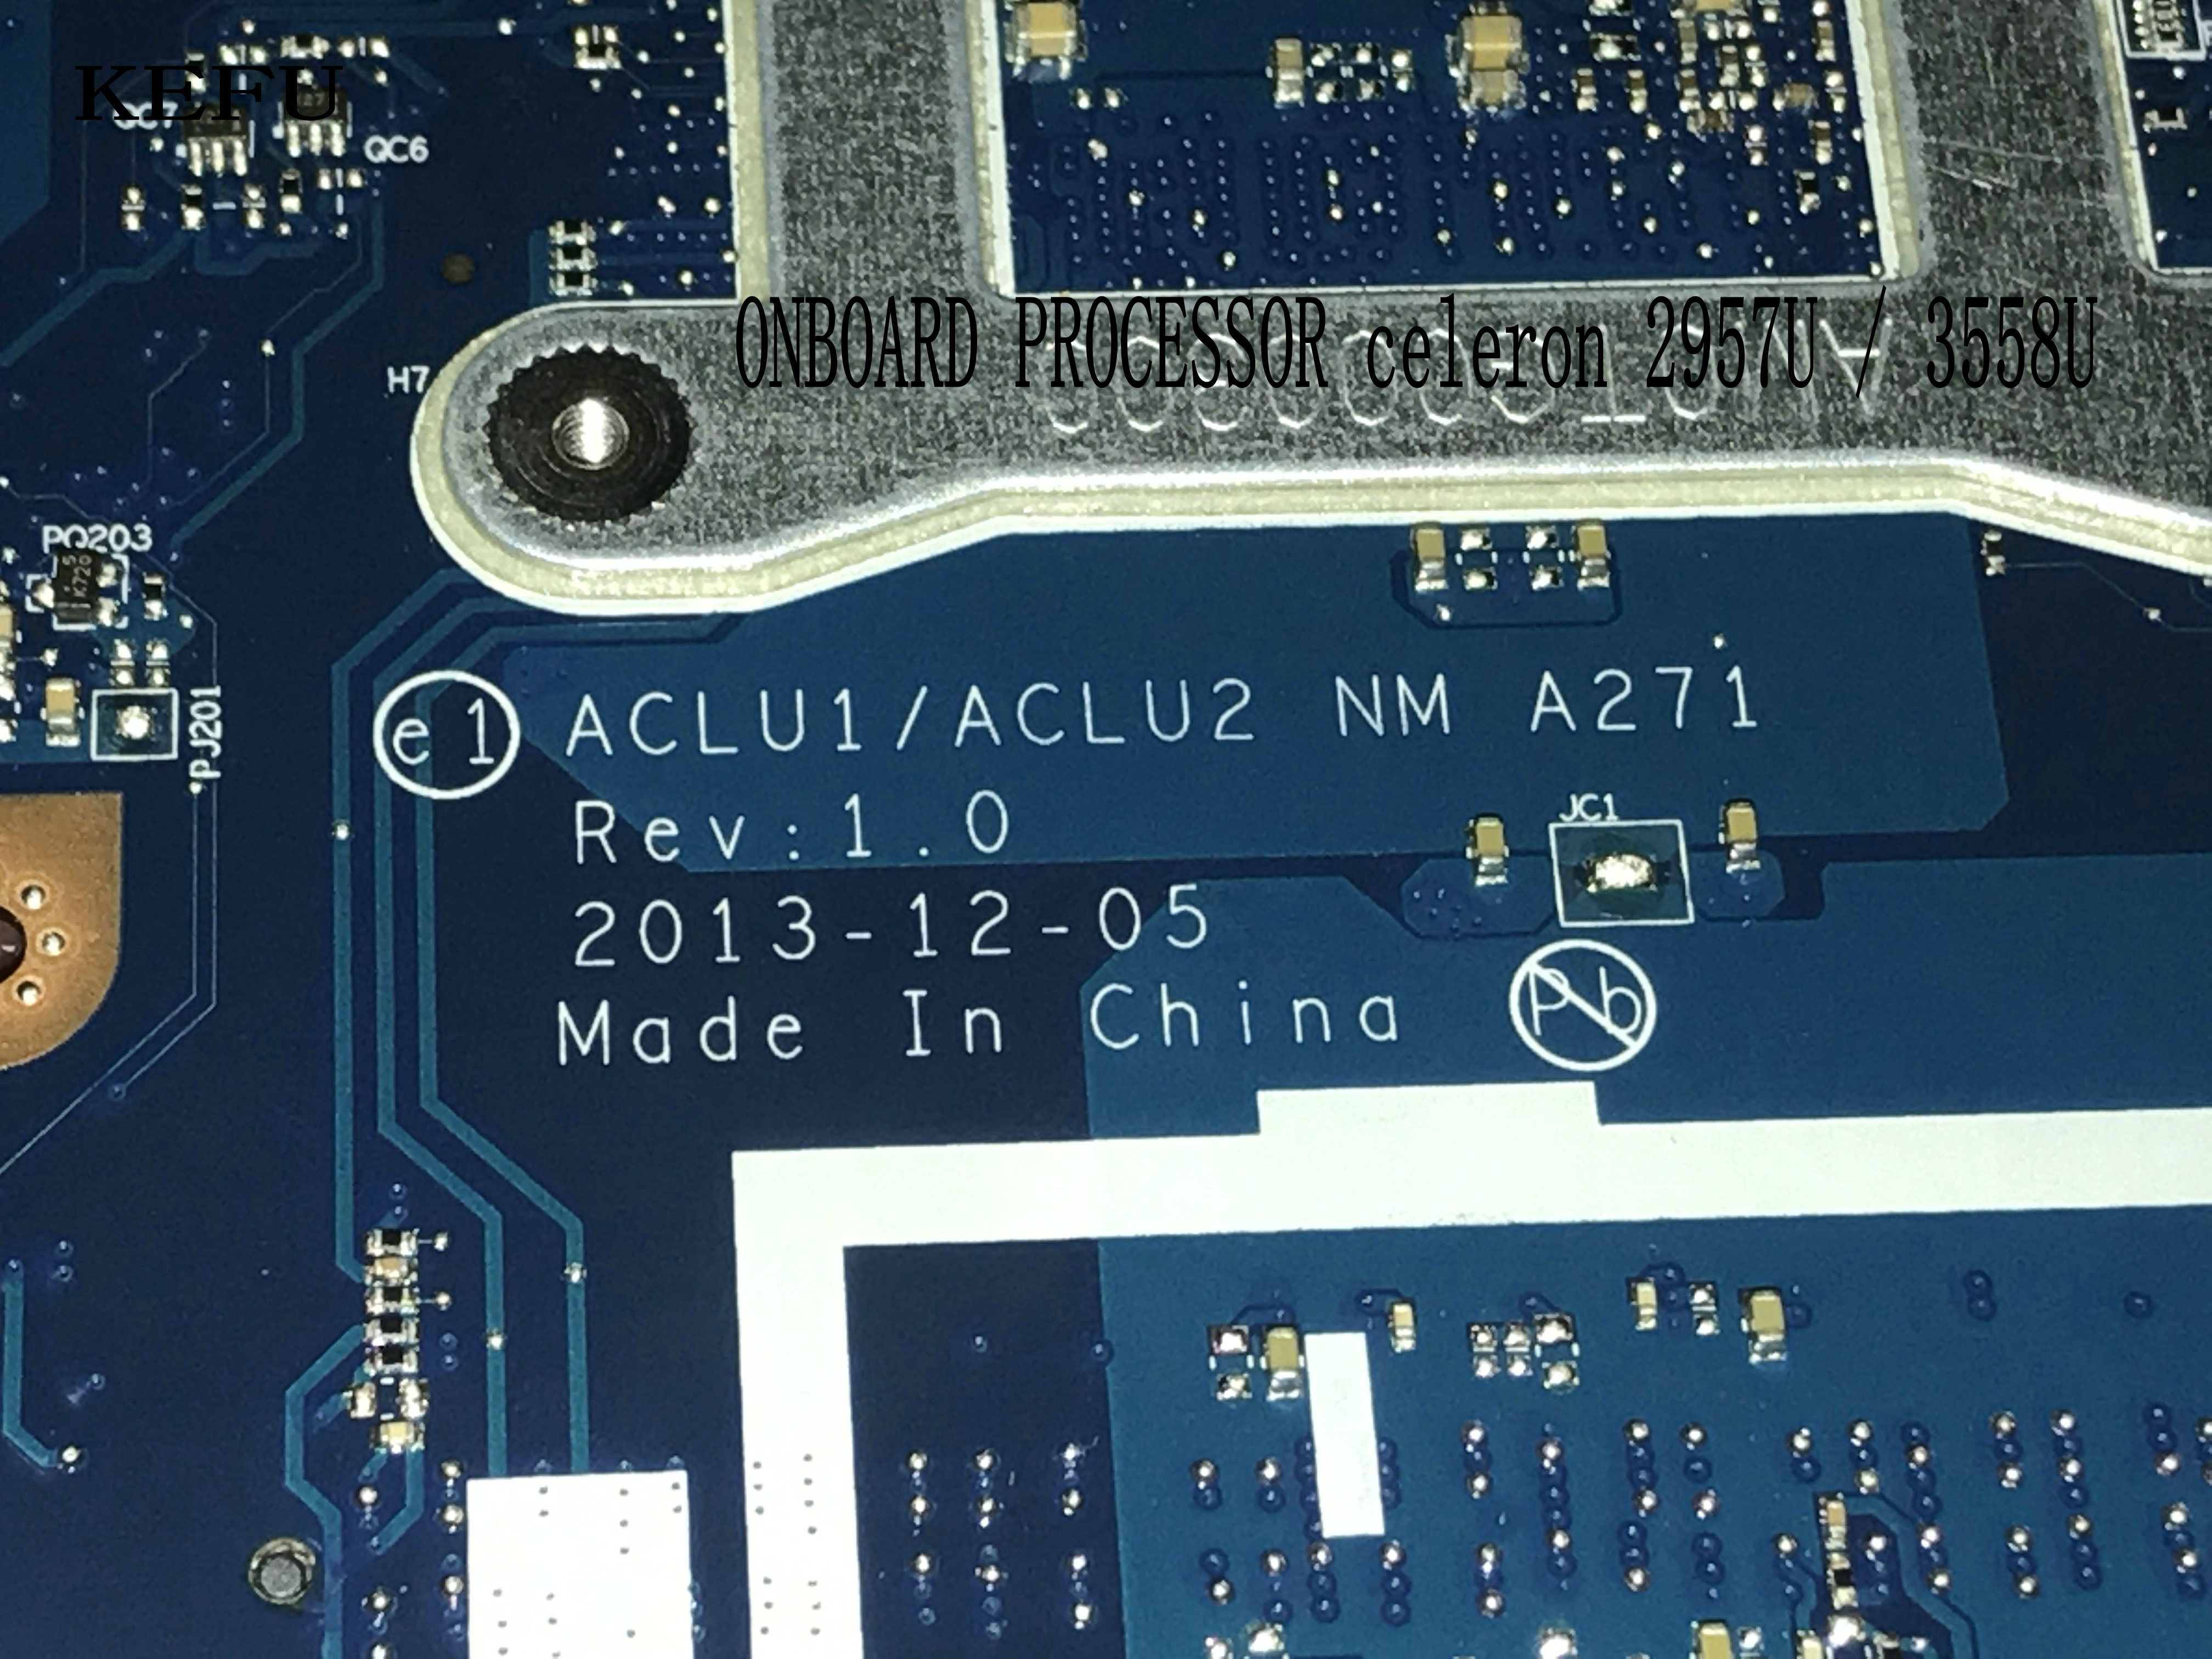 KEFU STOCK  ,ACLU1/ ACLU2 NM A271 For LENOVO G50-70 Laptop Motherboard ,PROCESSOR  3558U +VIDEO CARD ( NEW ITEM )